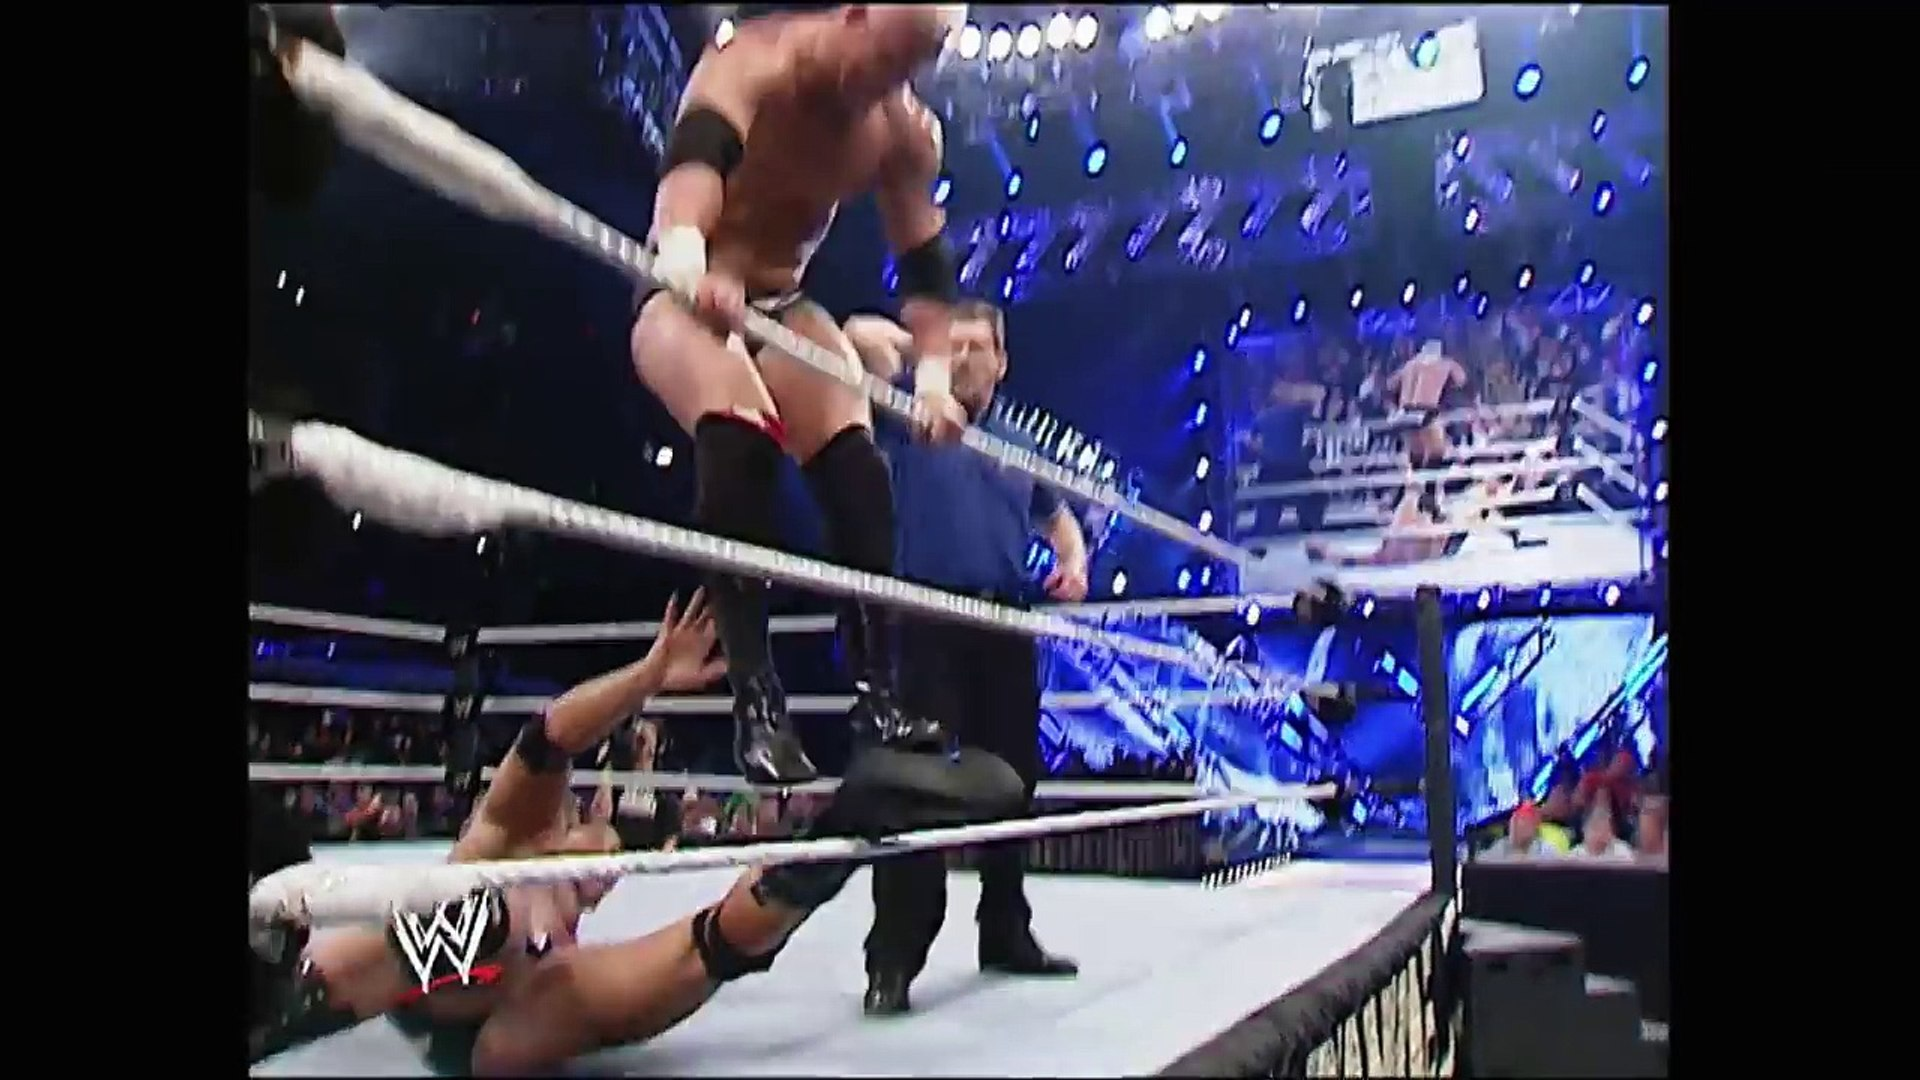 FULL MATCH — Batista vs. Mr. Kennedy - WWE World Heavyweight Title Match- Royal  Rumble 2007 - video Dailymotion